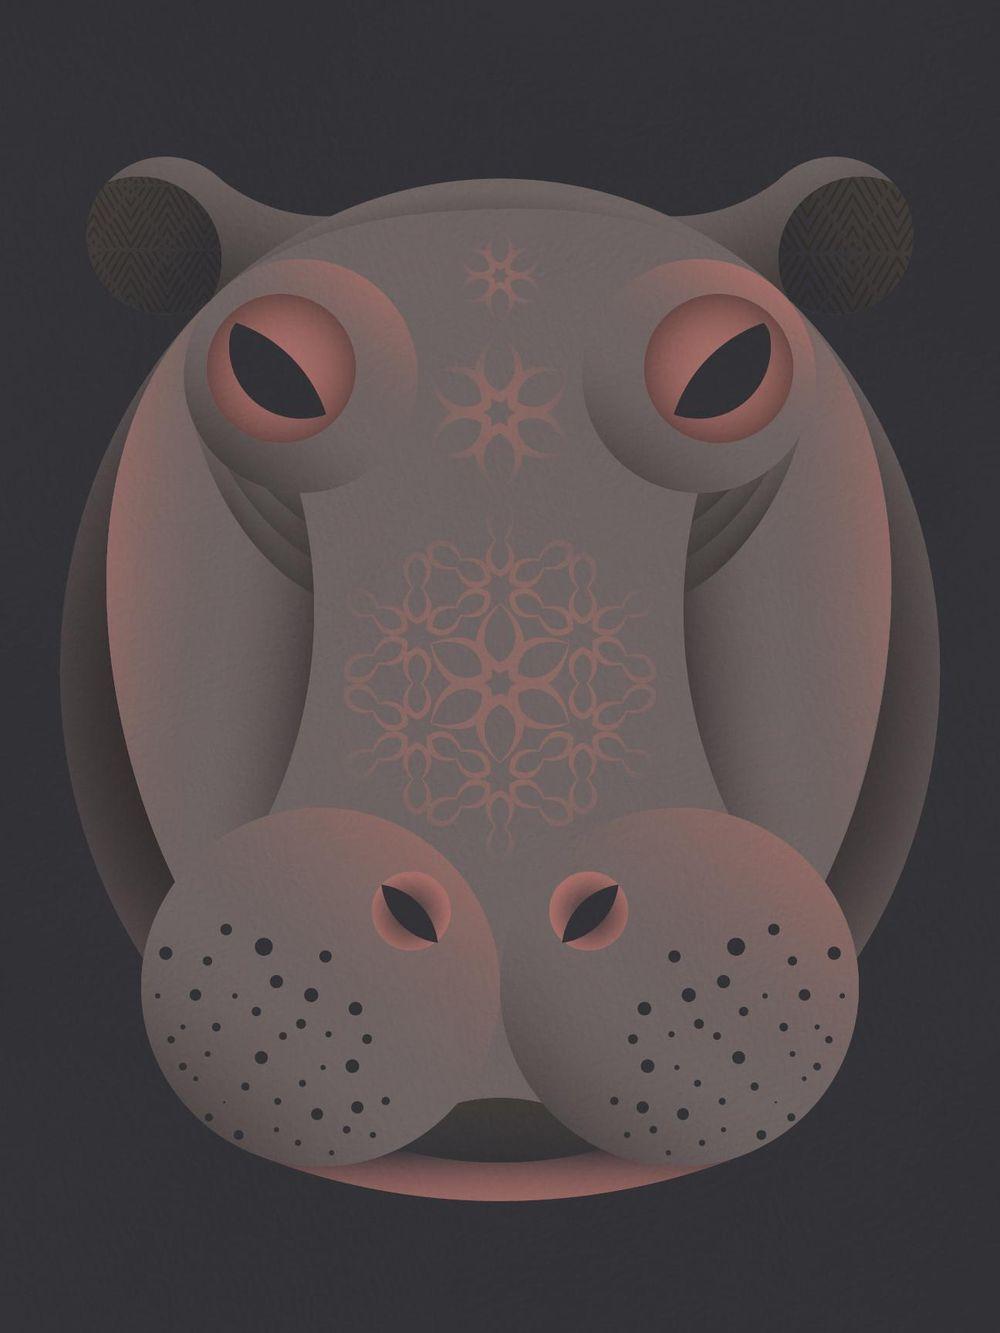 Giraffe - image 6 - student project